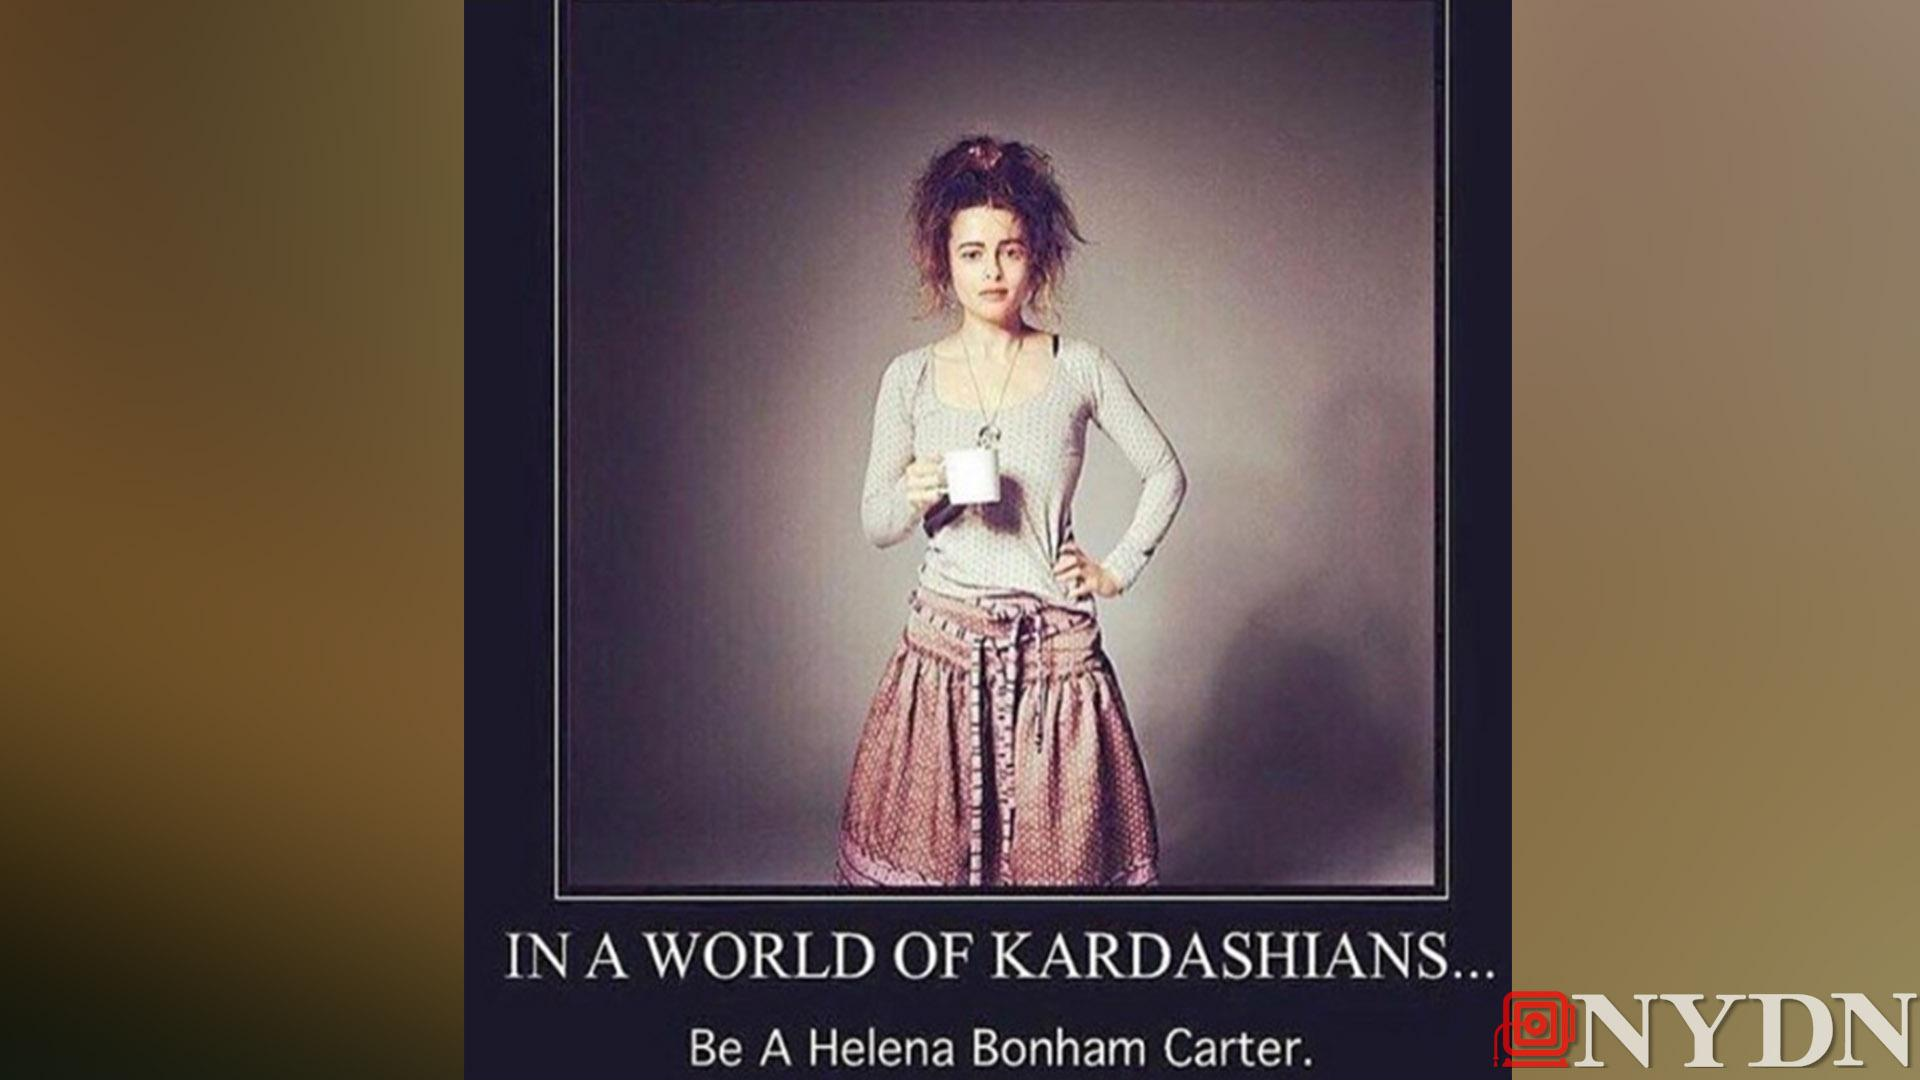 Anne Hathaway Removes Instagram 'Meme' Against Kardashian Klan